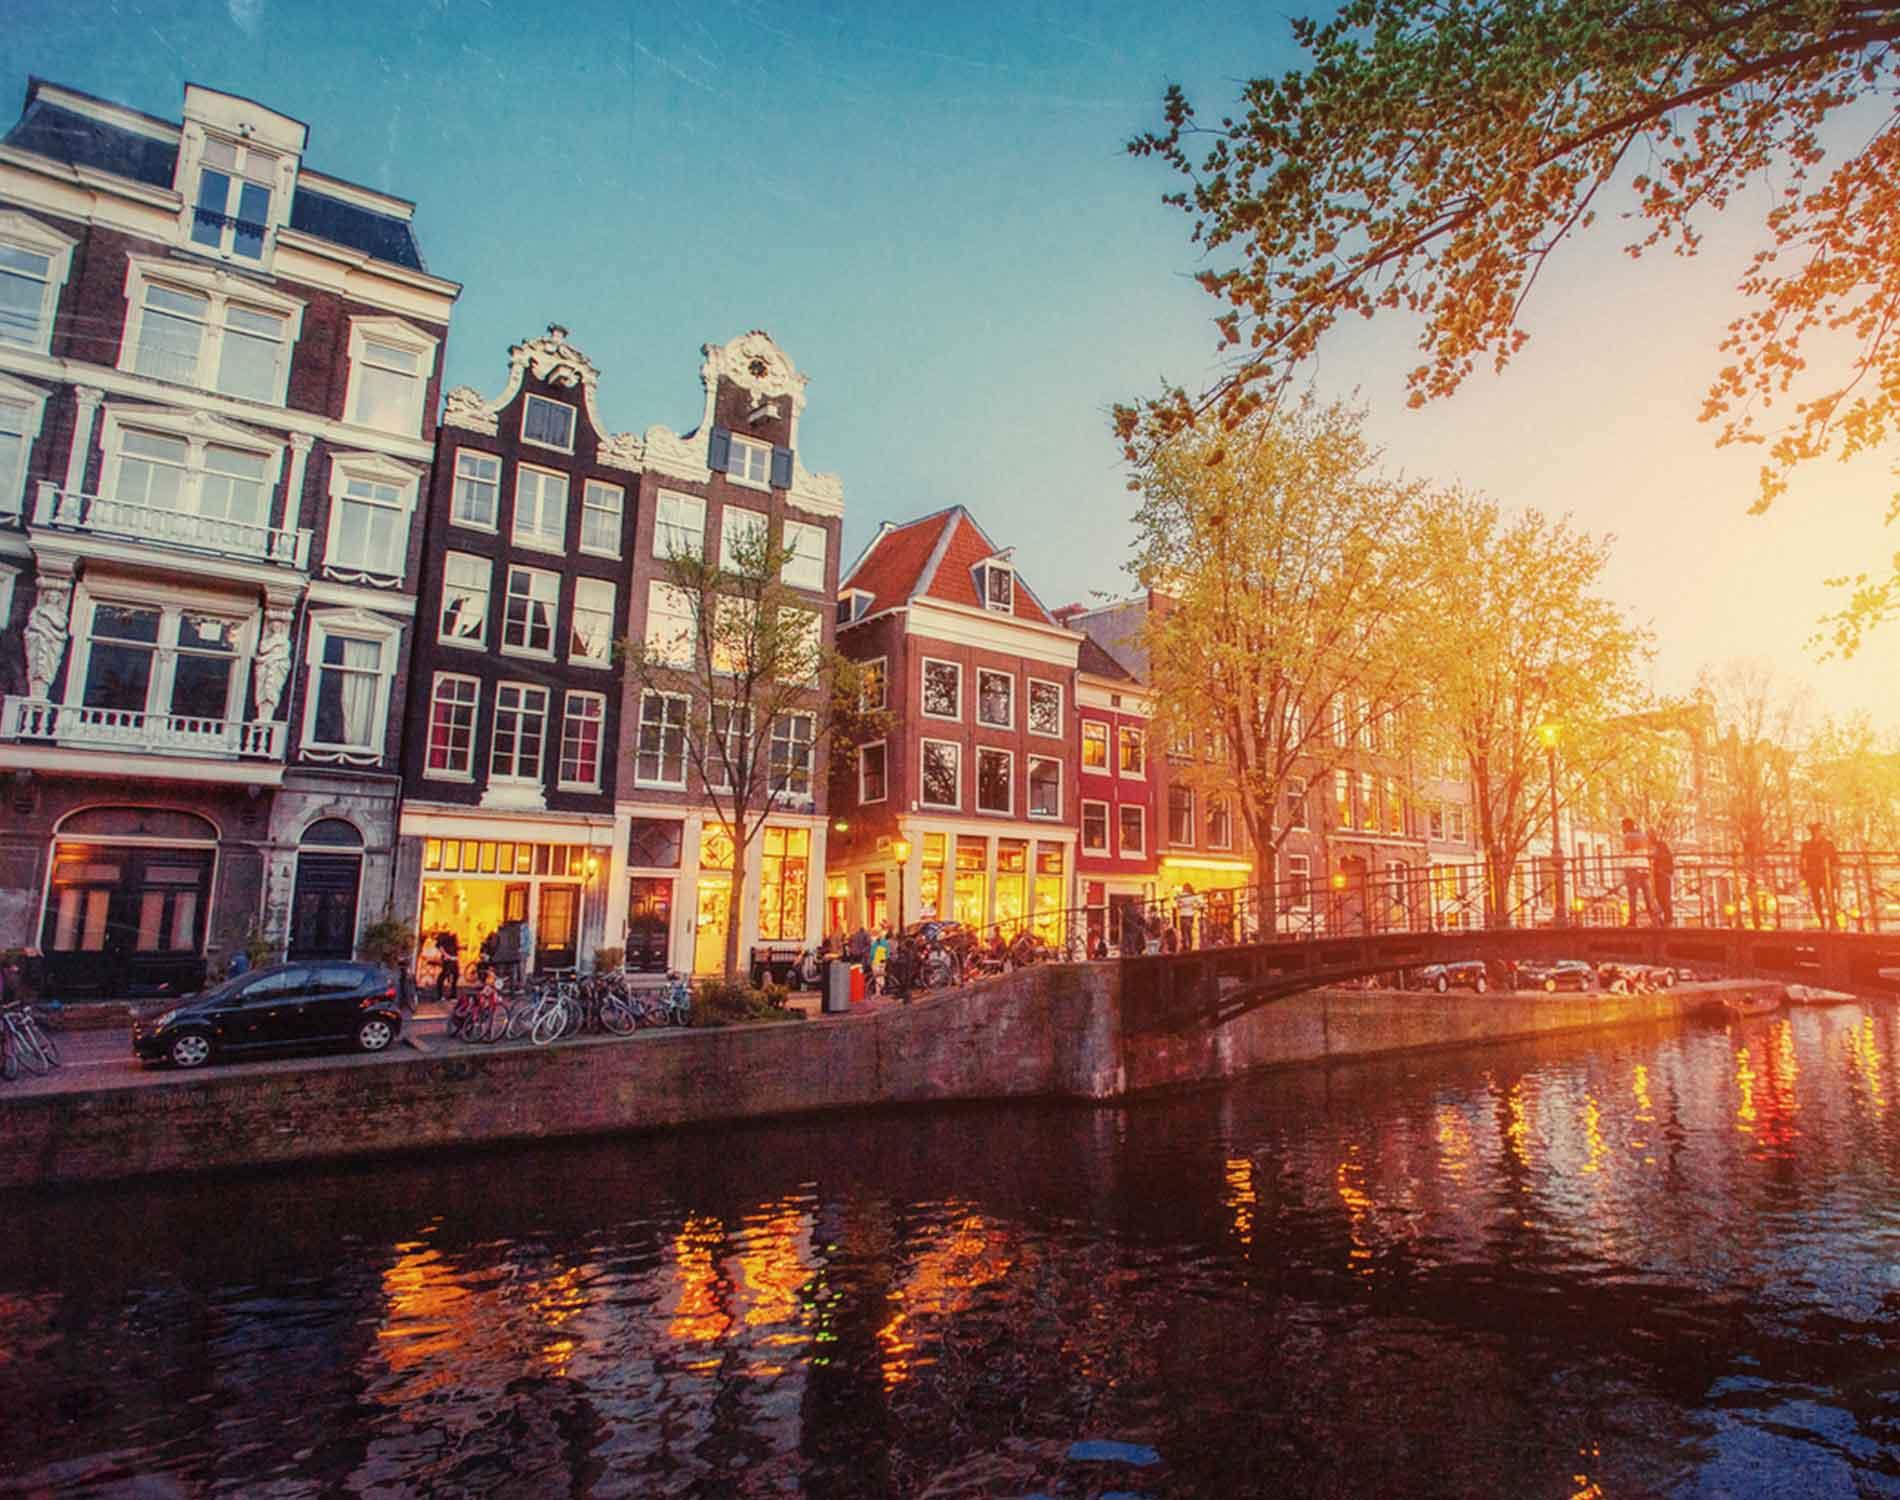 Amsterdam_1900x1500px.jpg